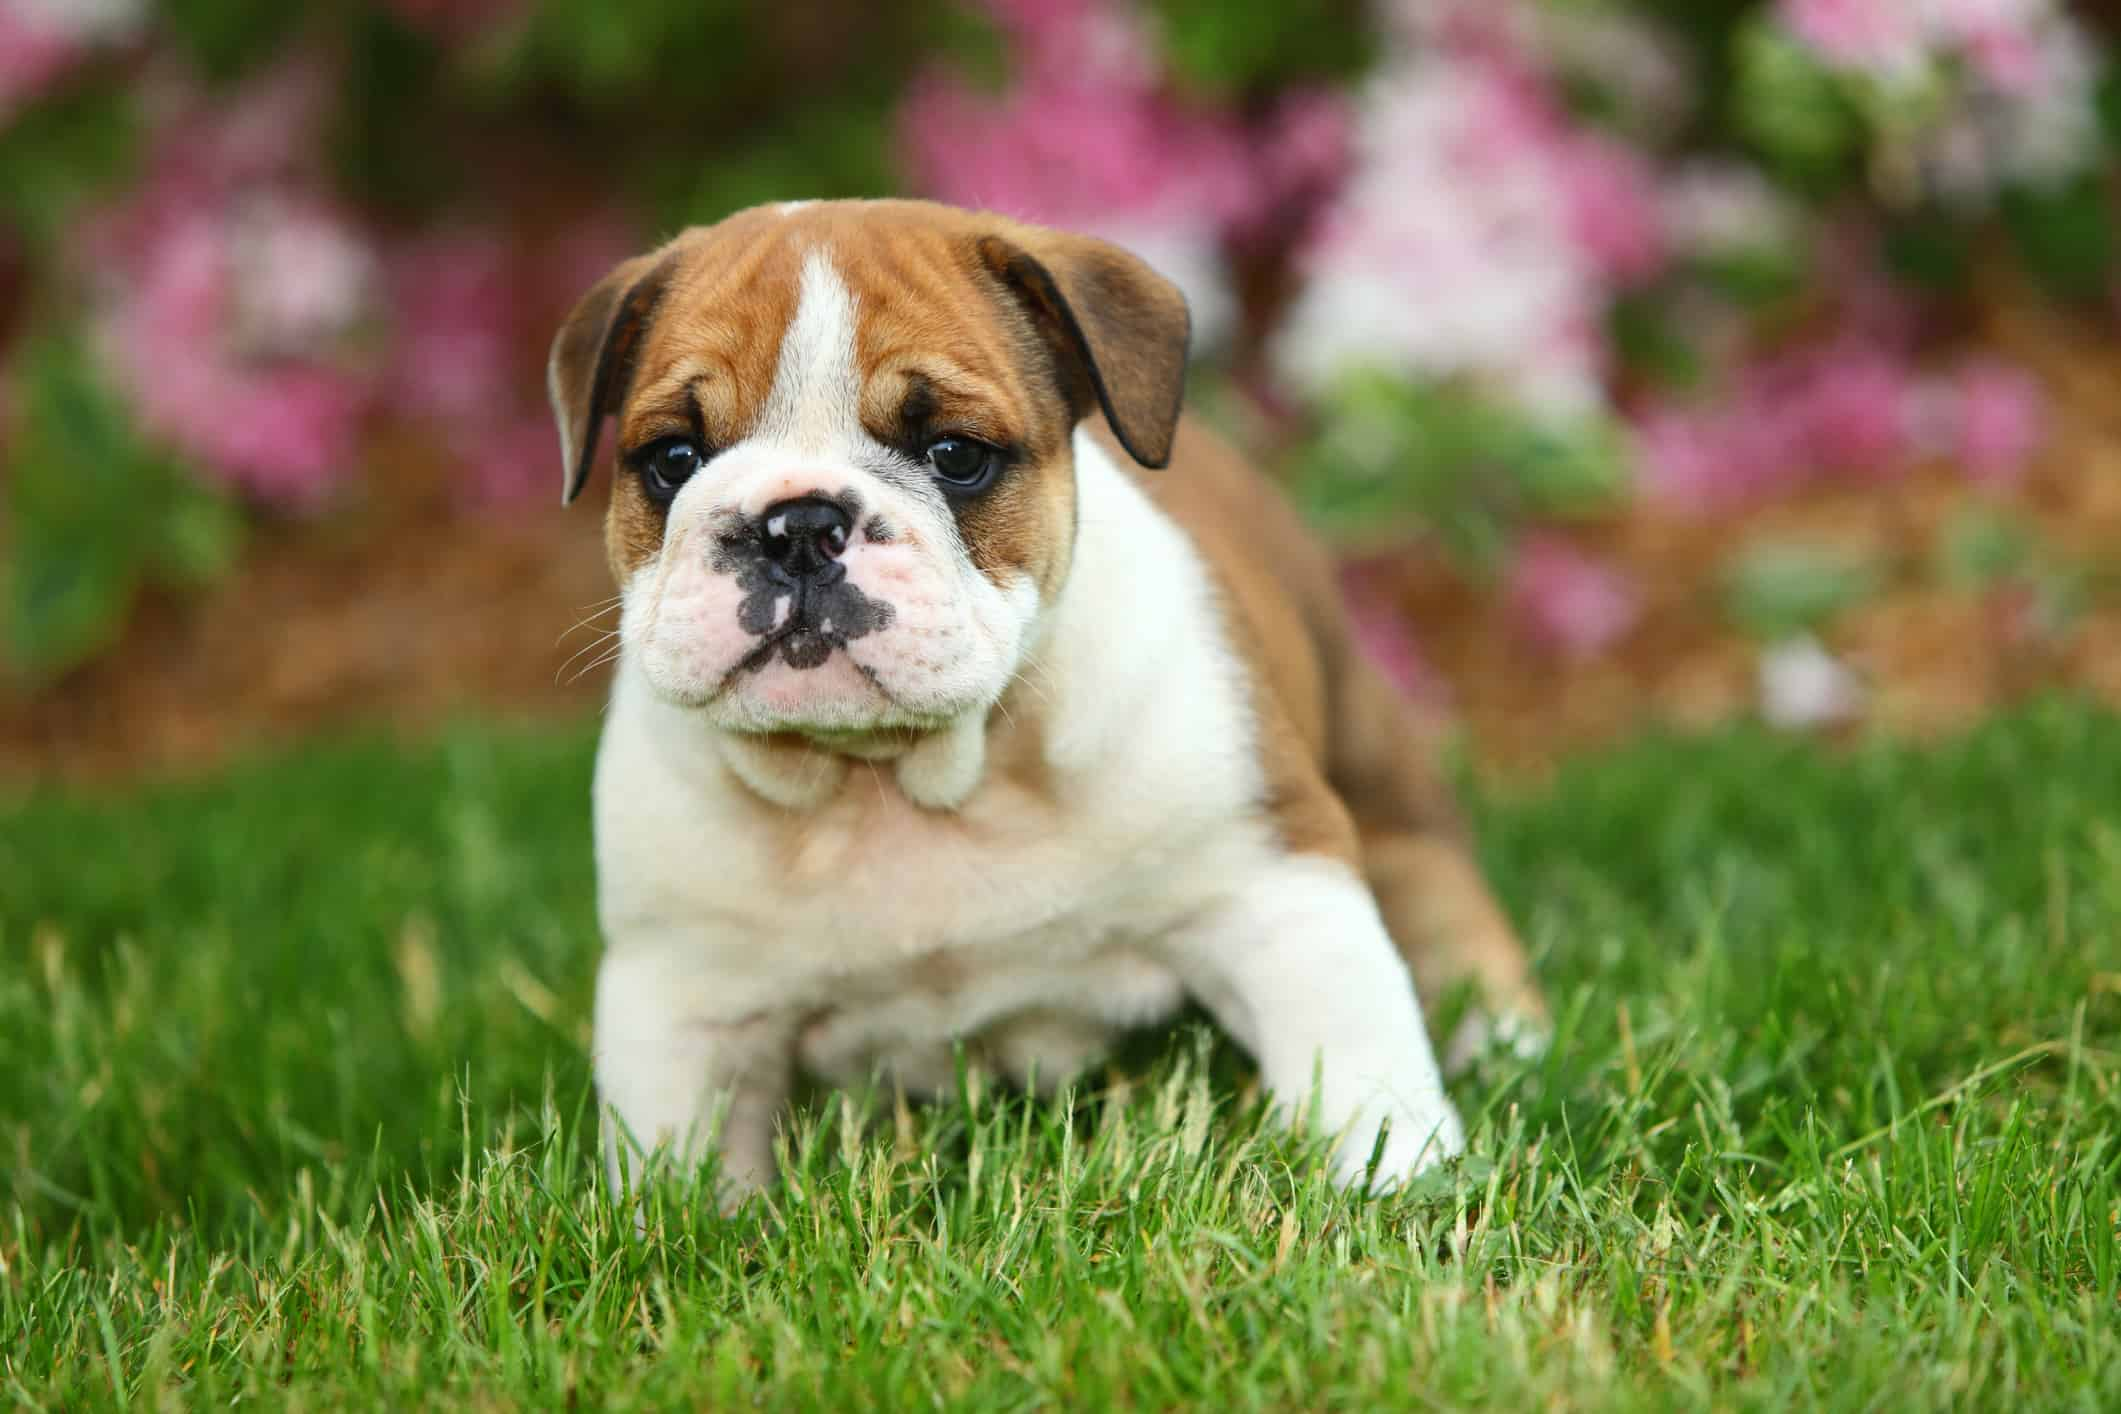 bulldog puppy sitting in grass